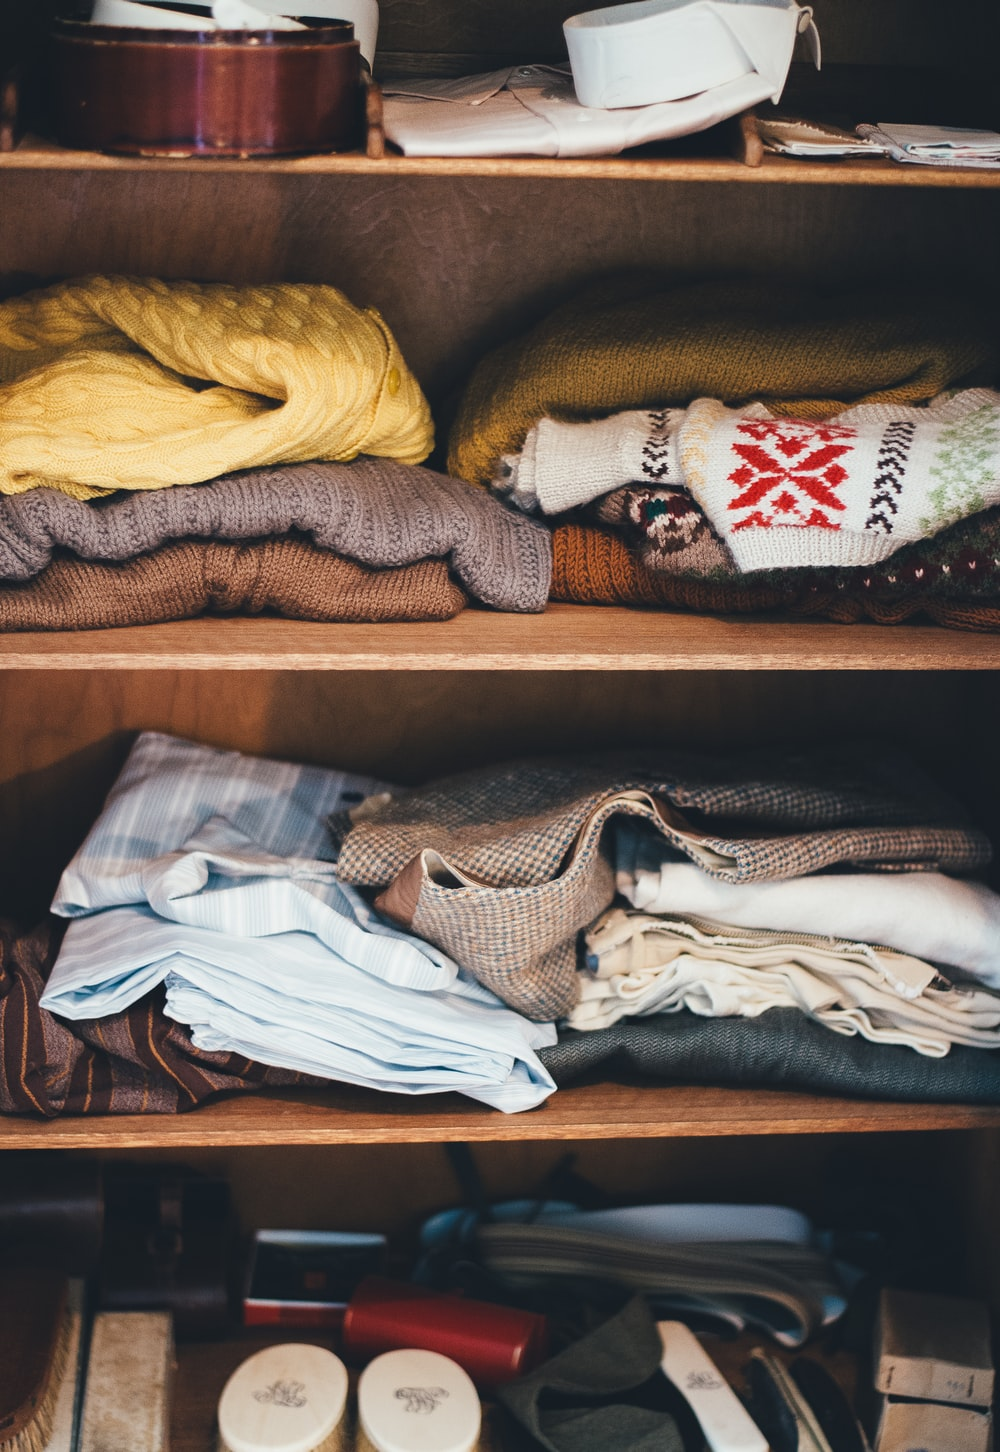 clothes lot on shelf